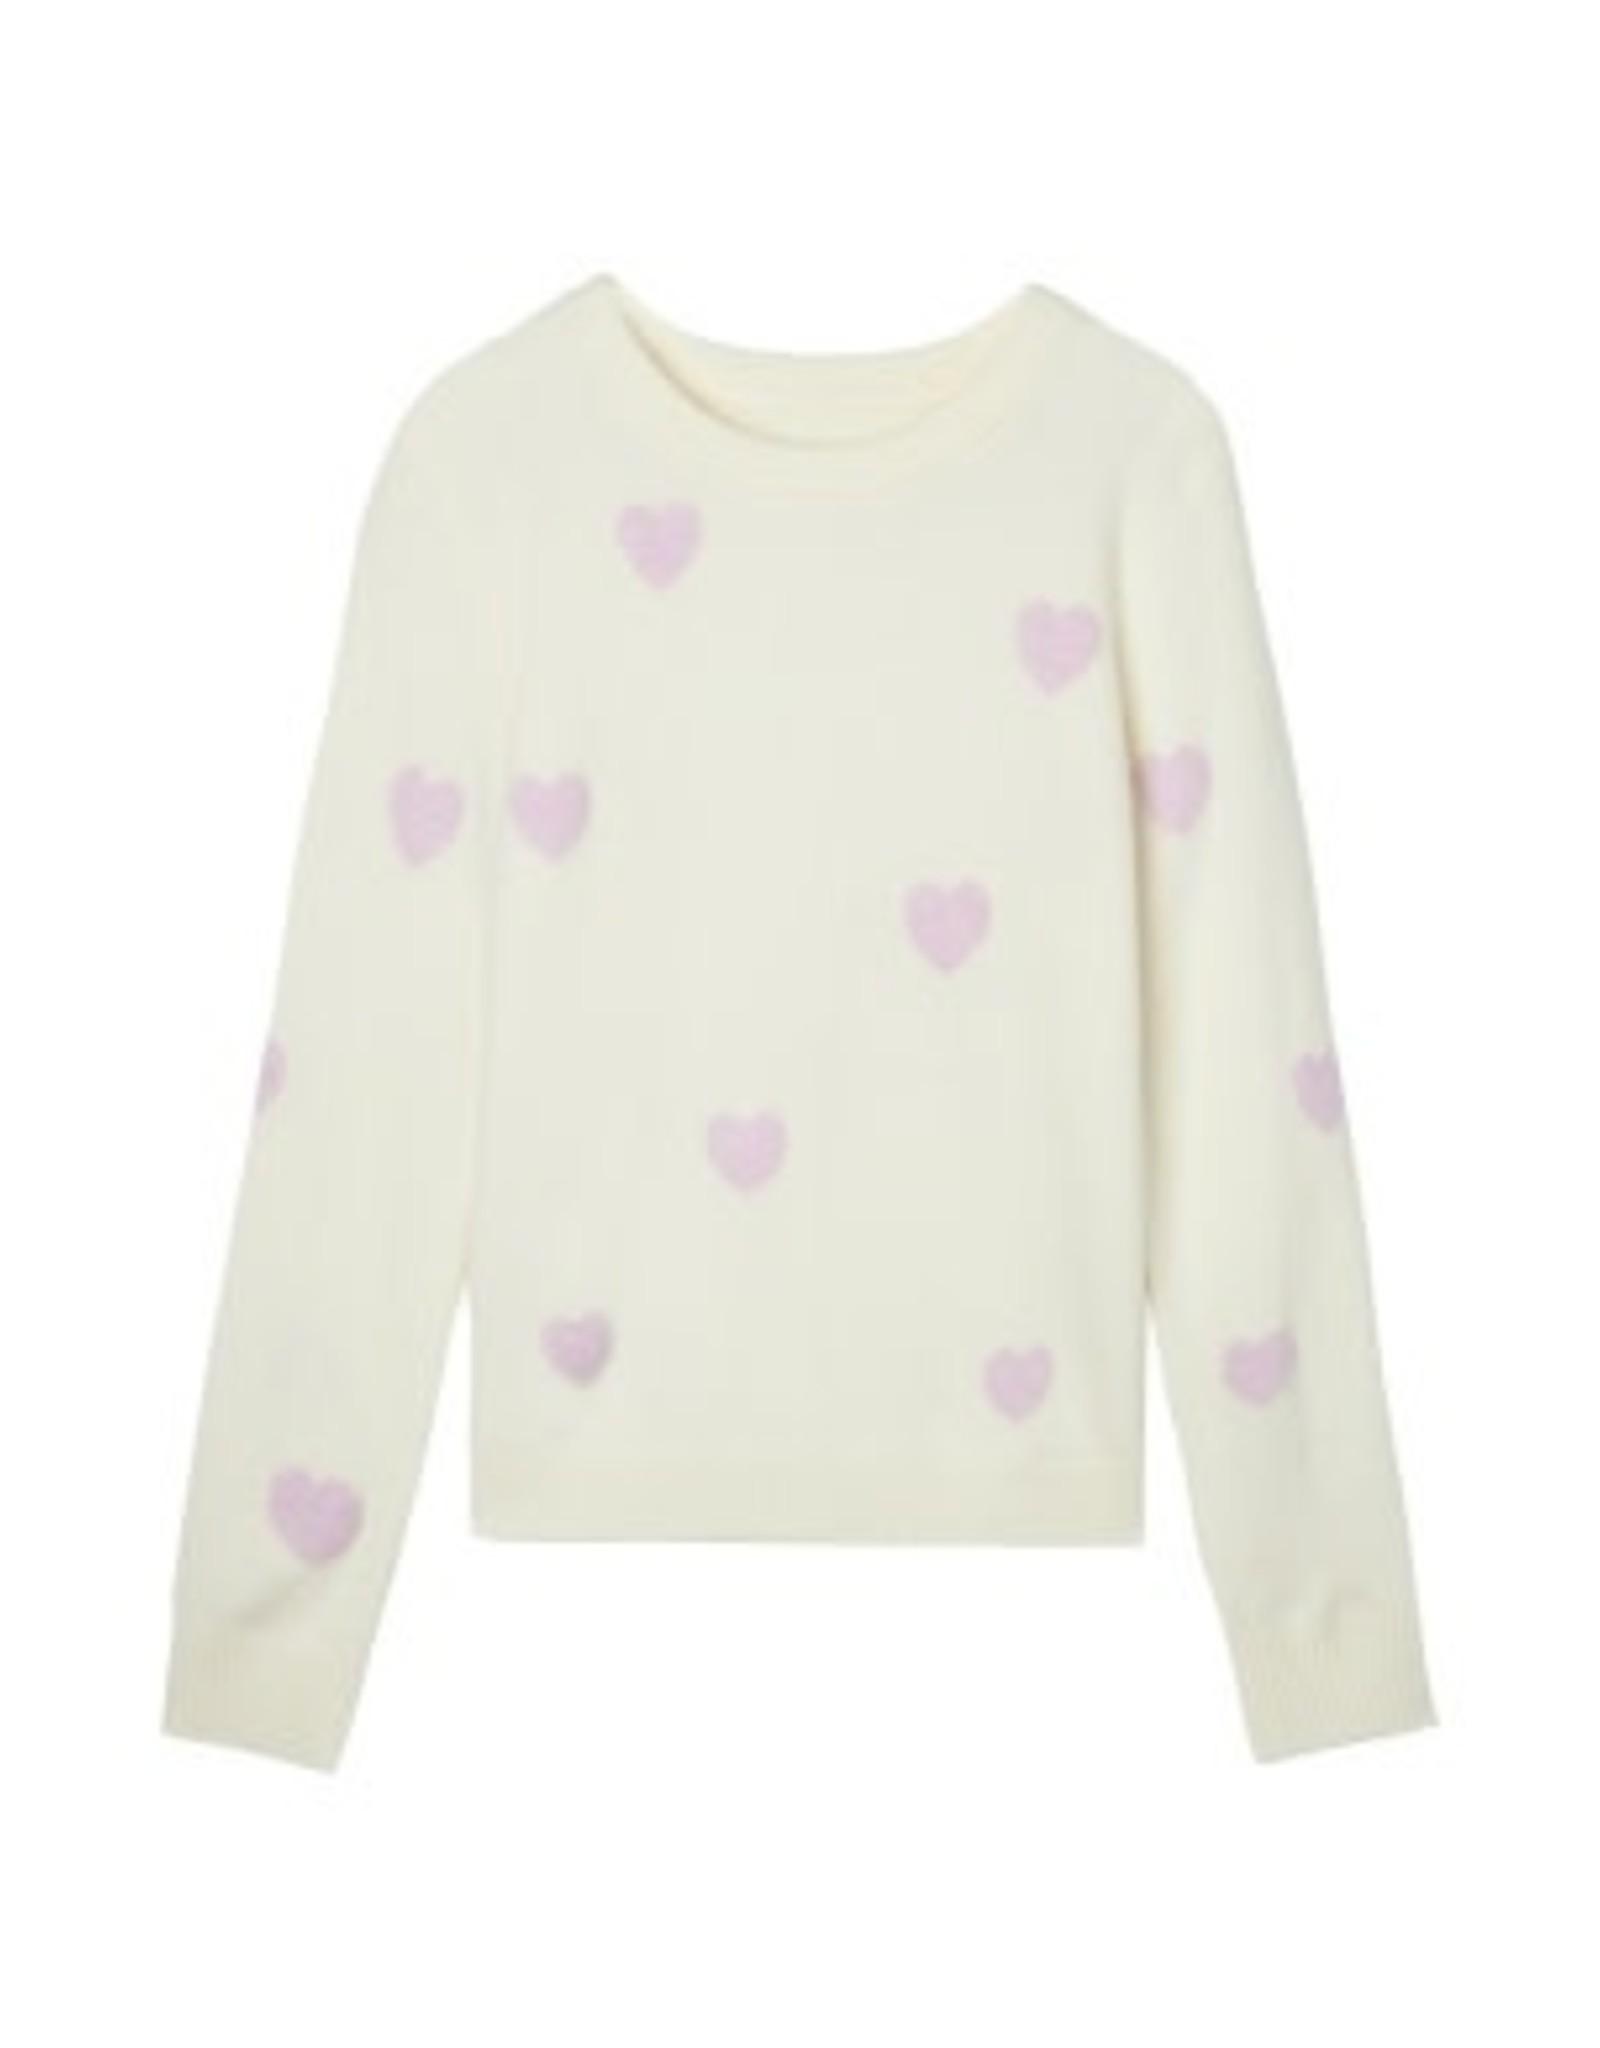 SG Girls Brooklyn Sweater